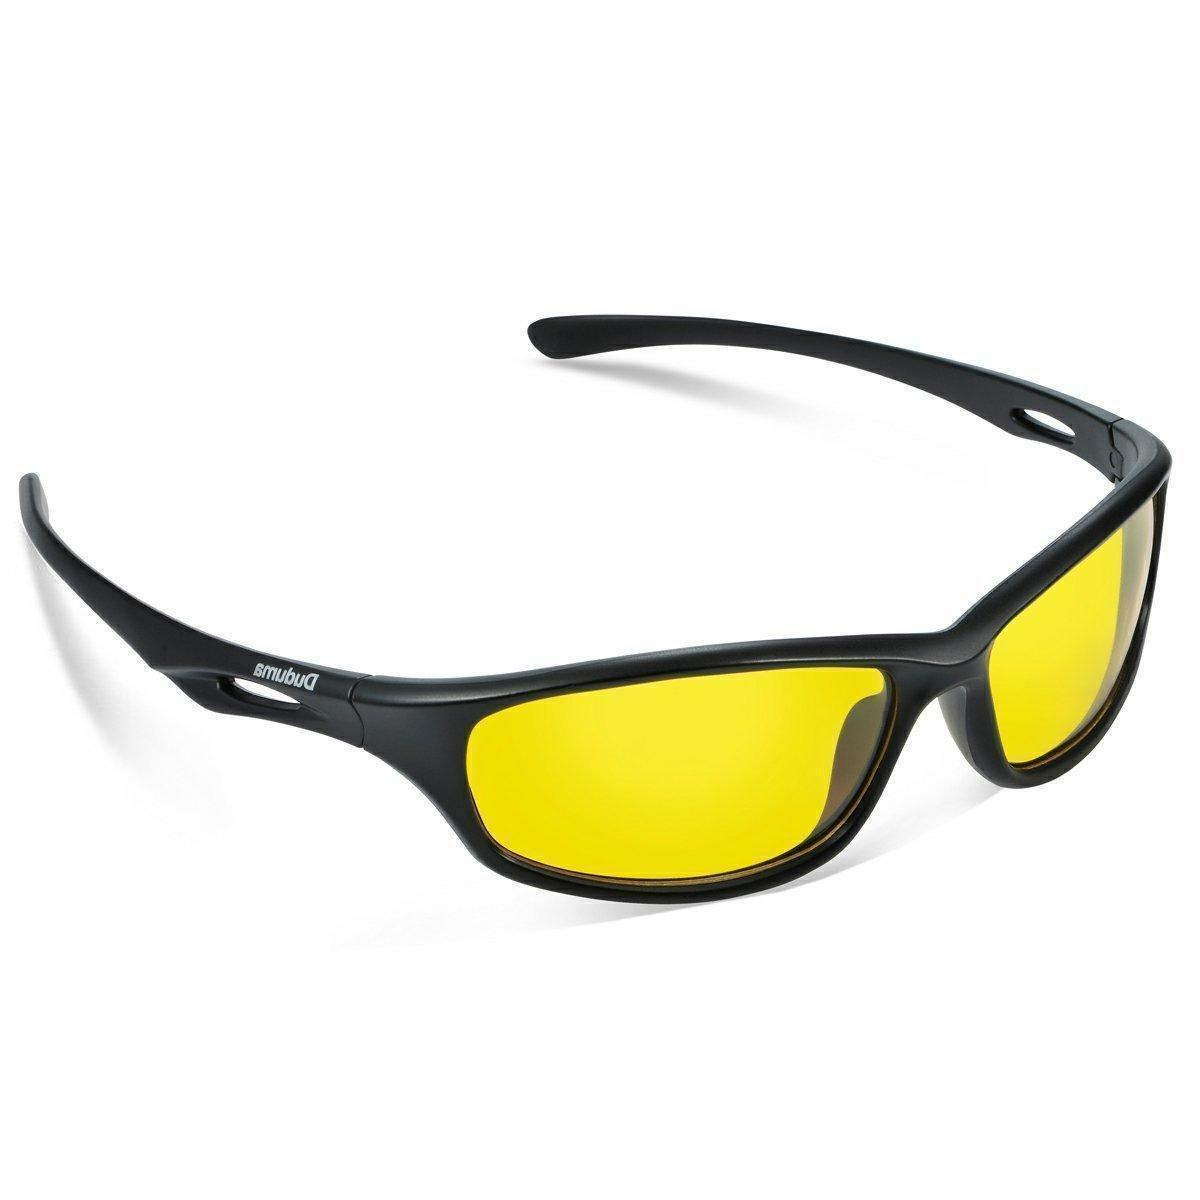 Duduma Yellow Night Vision Polarized Sunglasses Glasses for